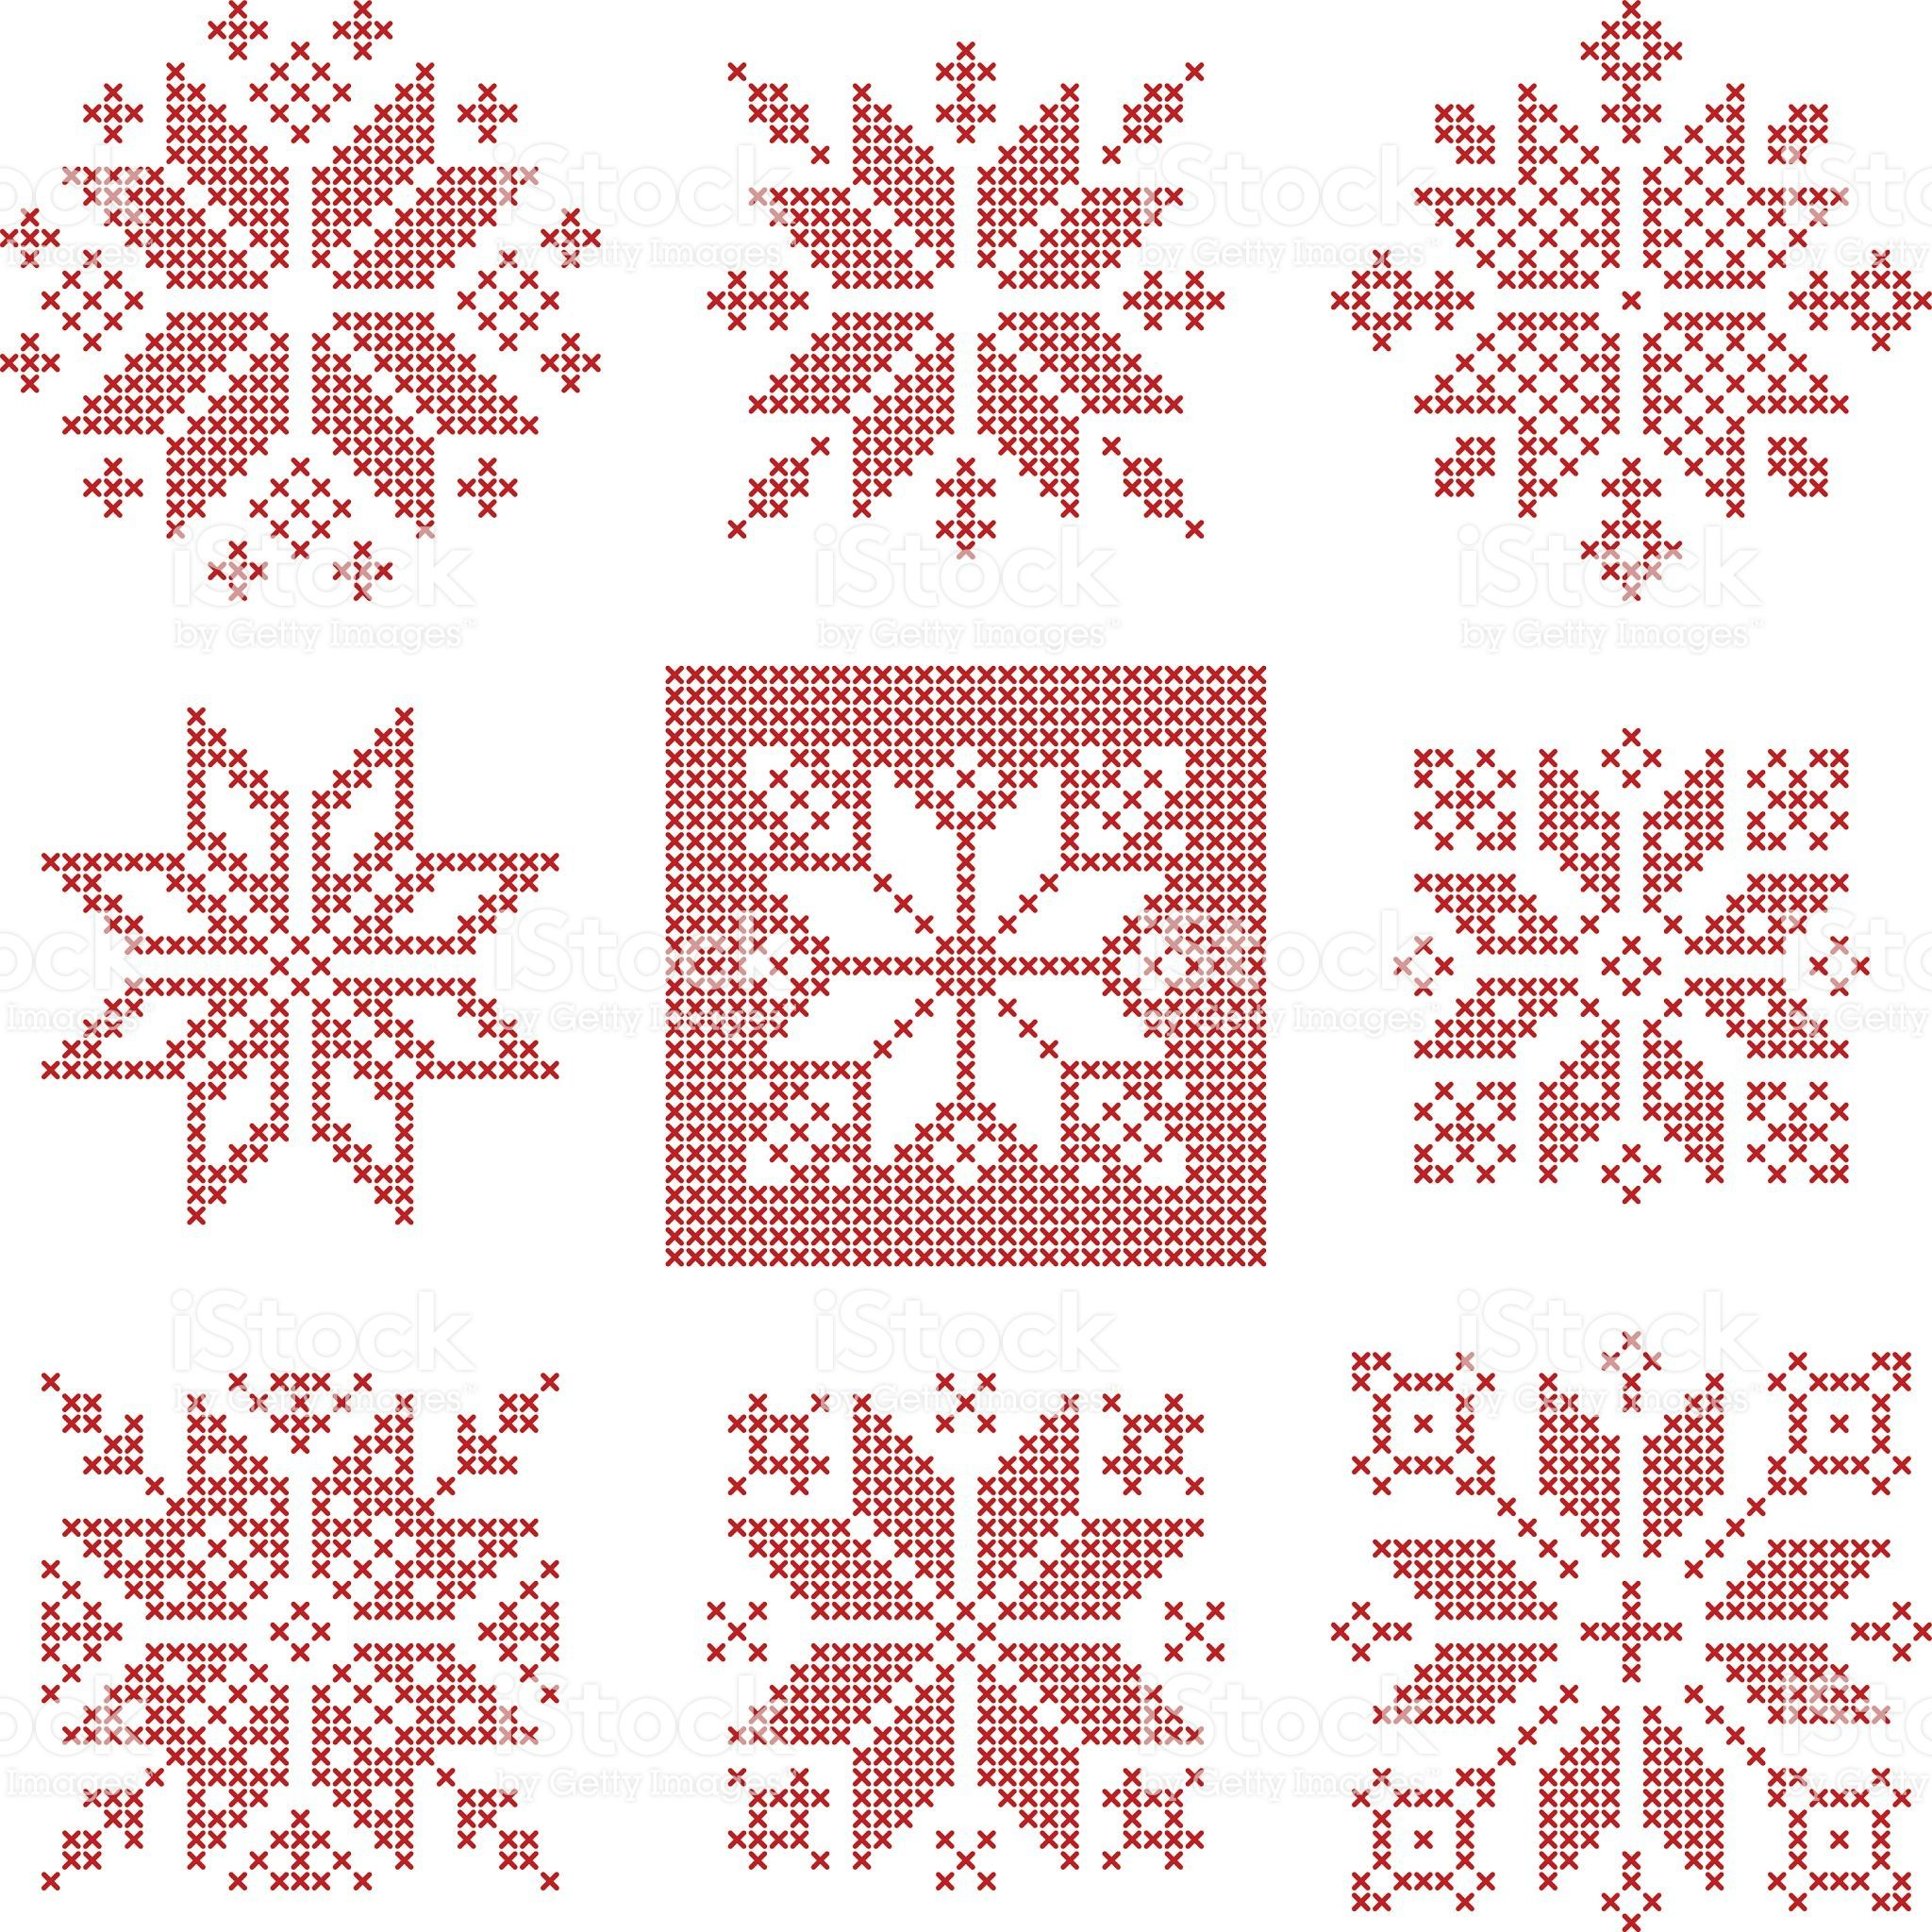 Set Of 9 Cross Stitch Snowflakes Pattern Scandinavian Style Cross Stitch Patterns Christmas Christmas Cross Stitch Patterns Free Snowflake Cross Stitch